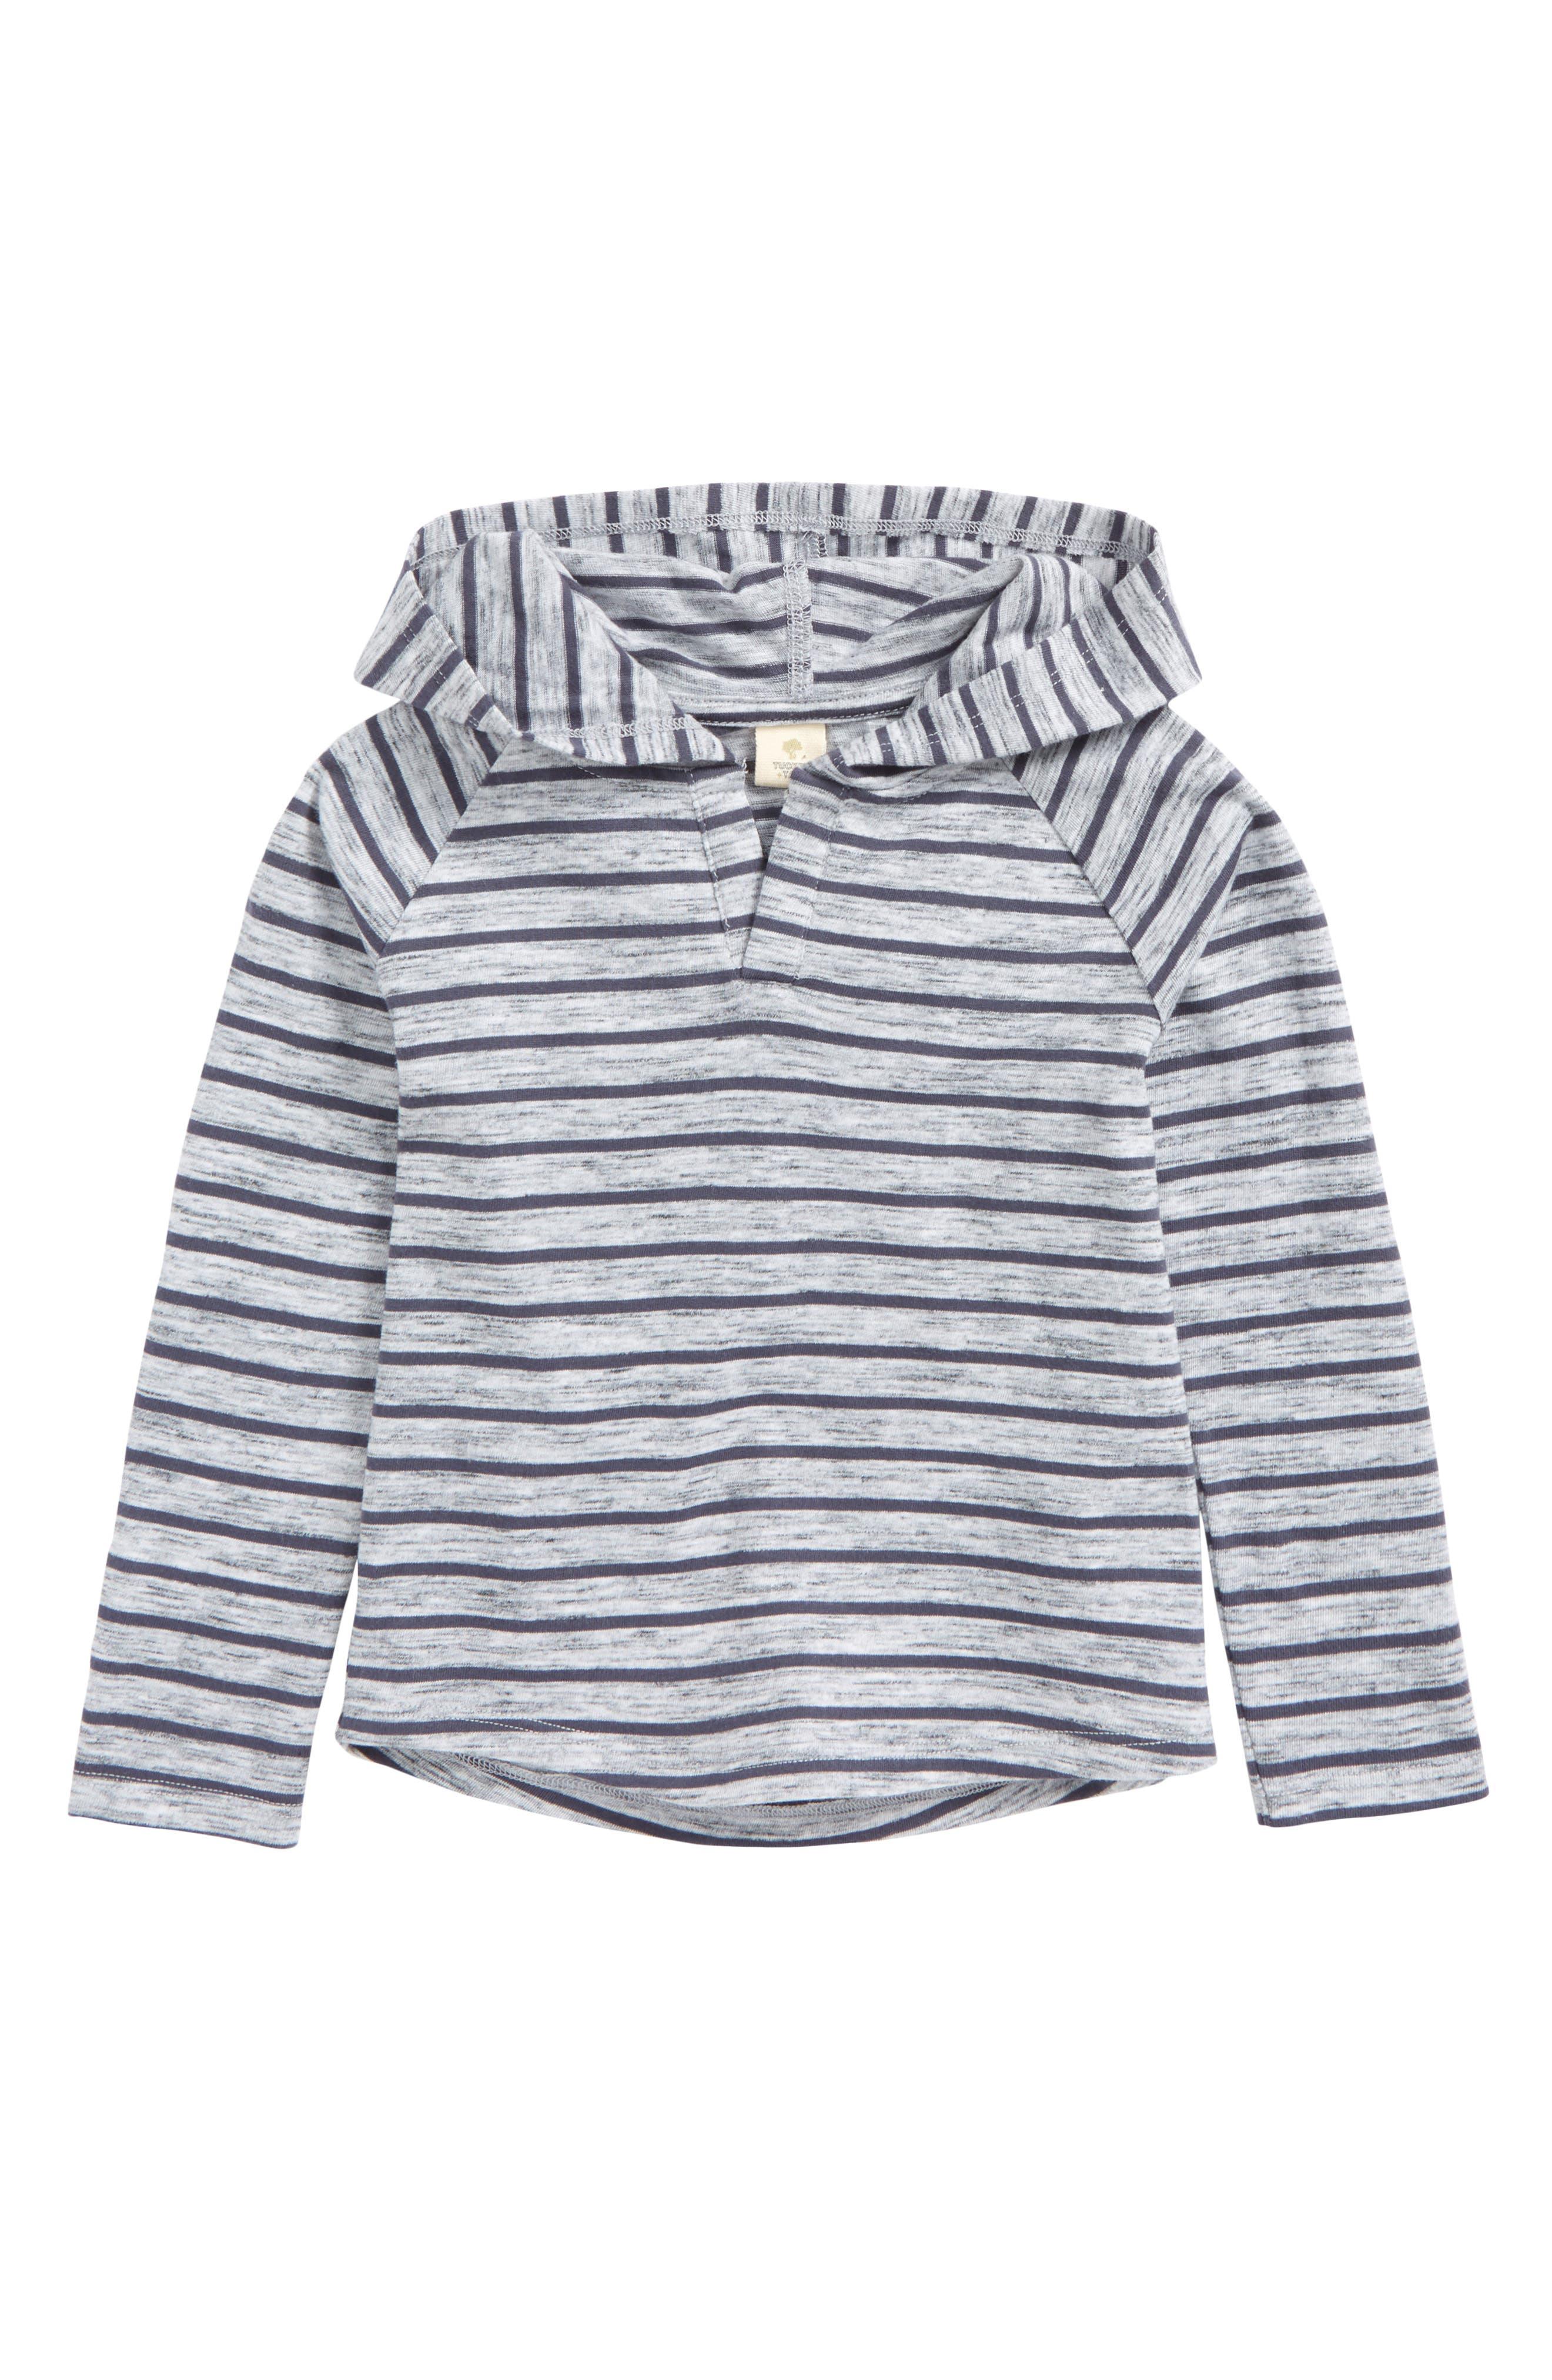 Tucker + Tate Hooded T-Shirt (Baby Boys)